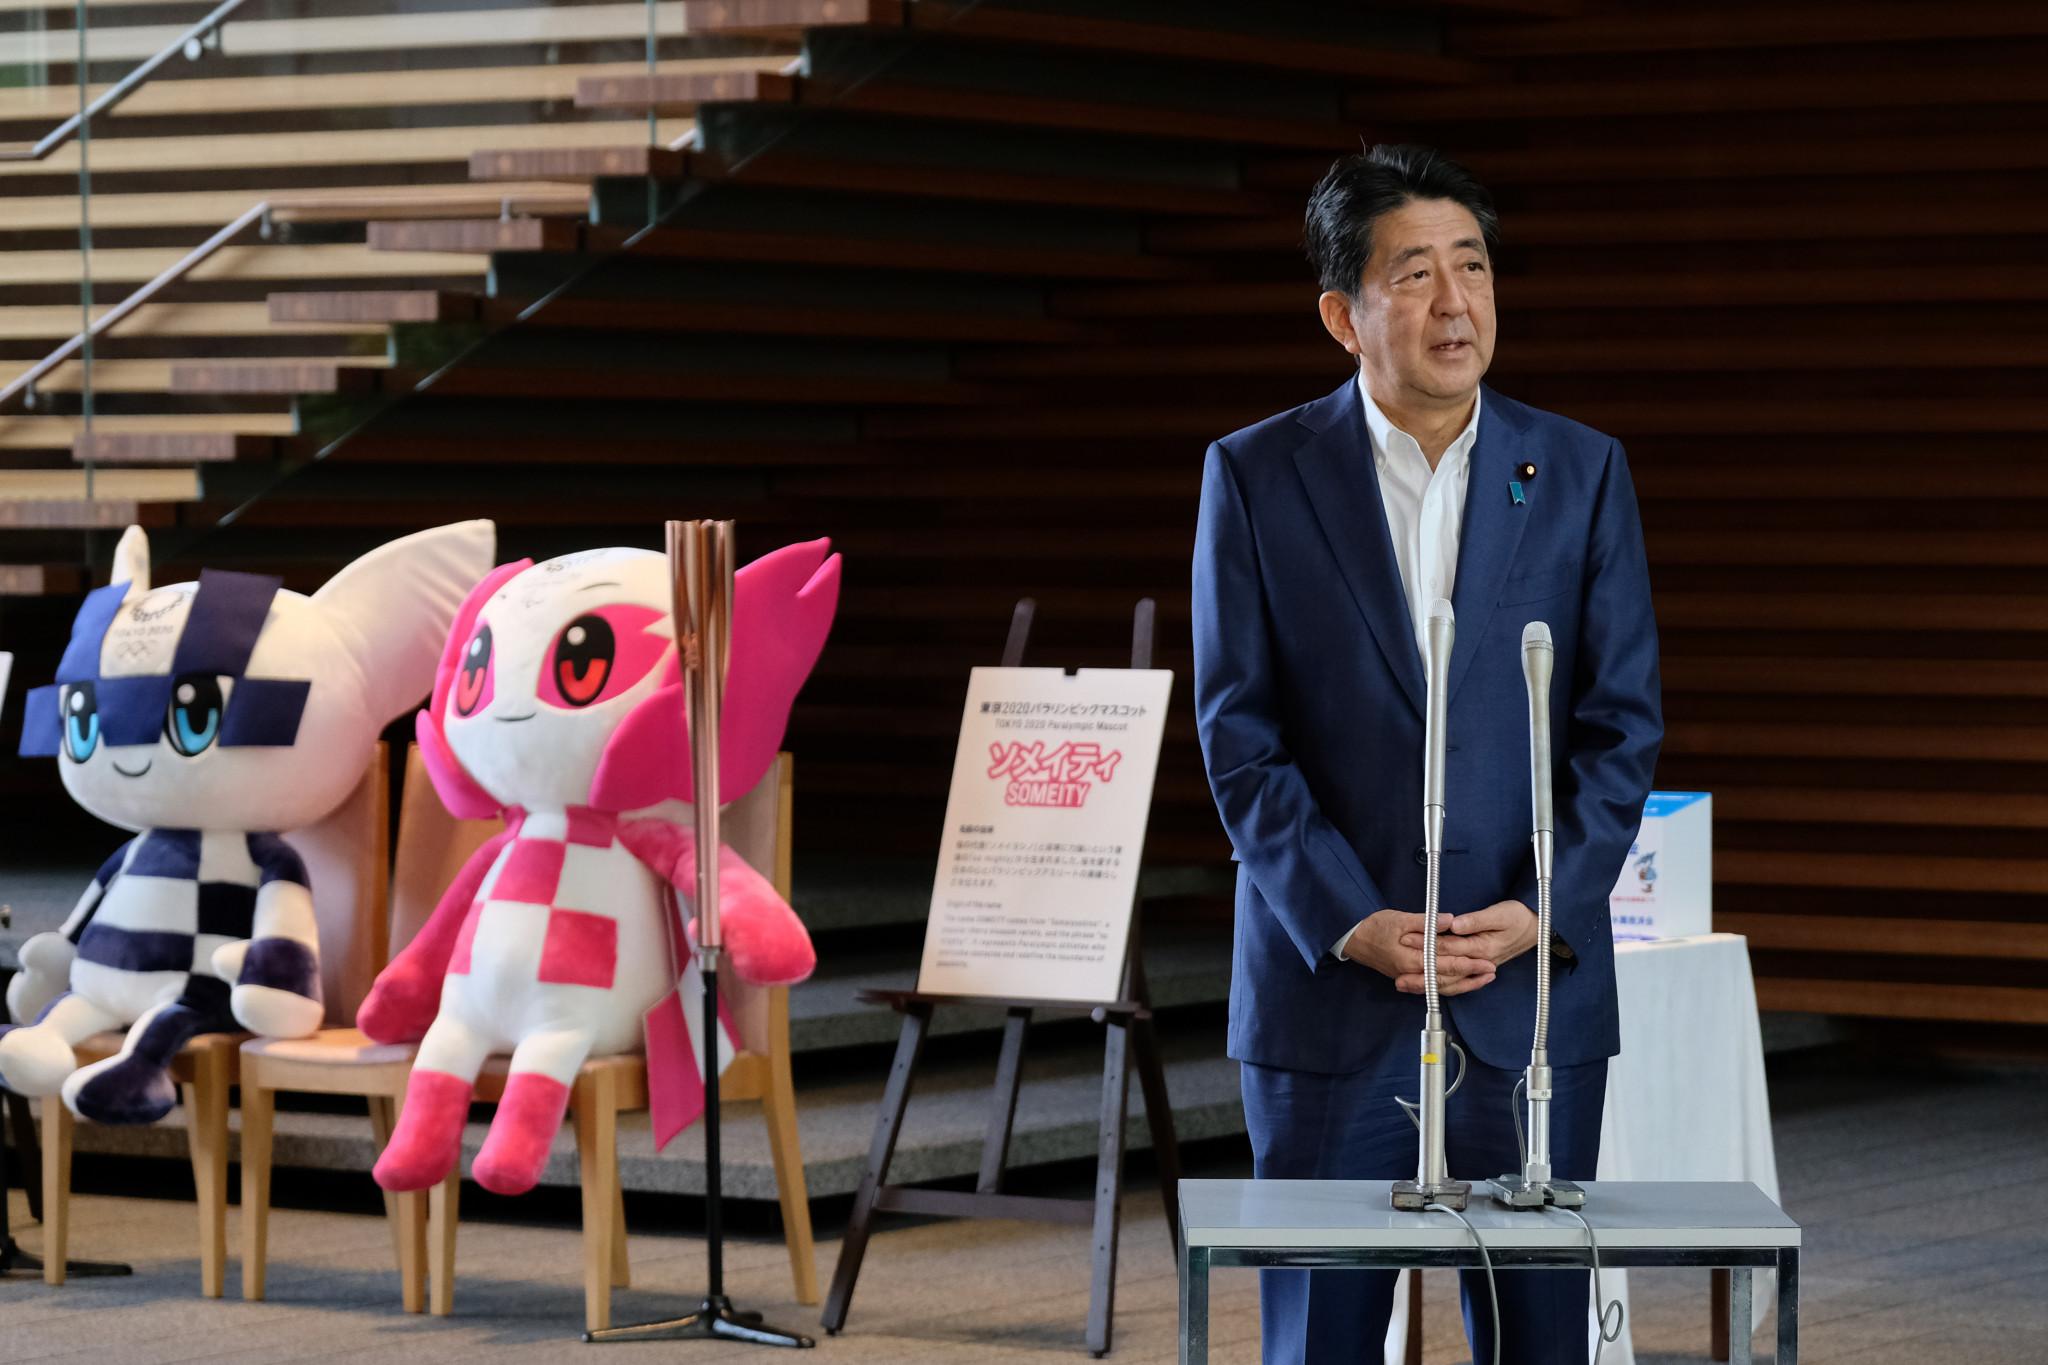 Japanese Prime Minister Abe steps down for health reasons